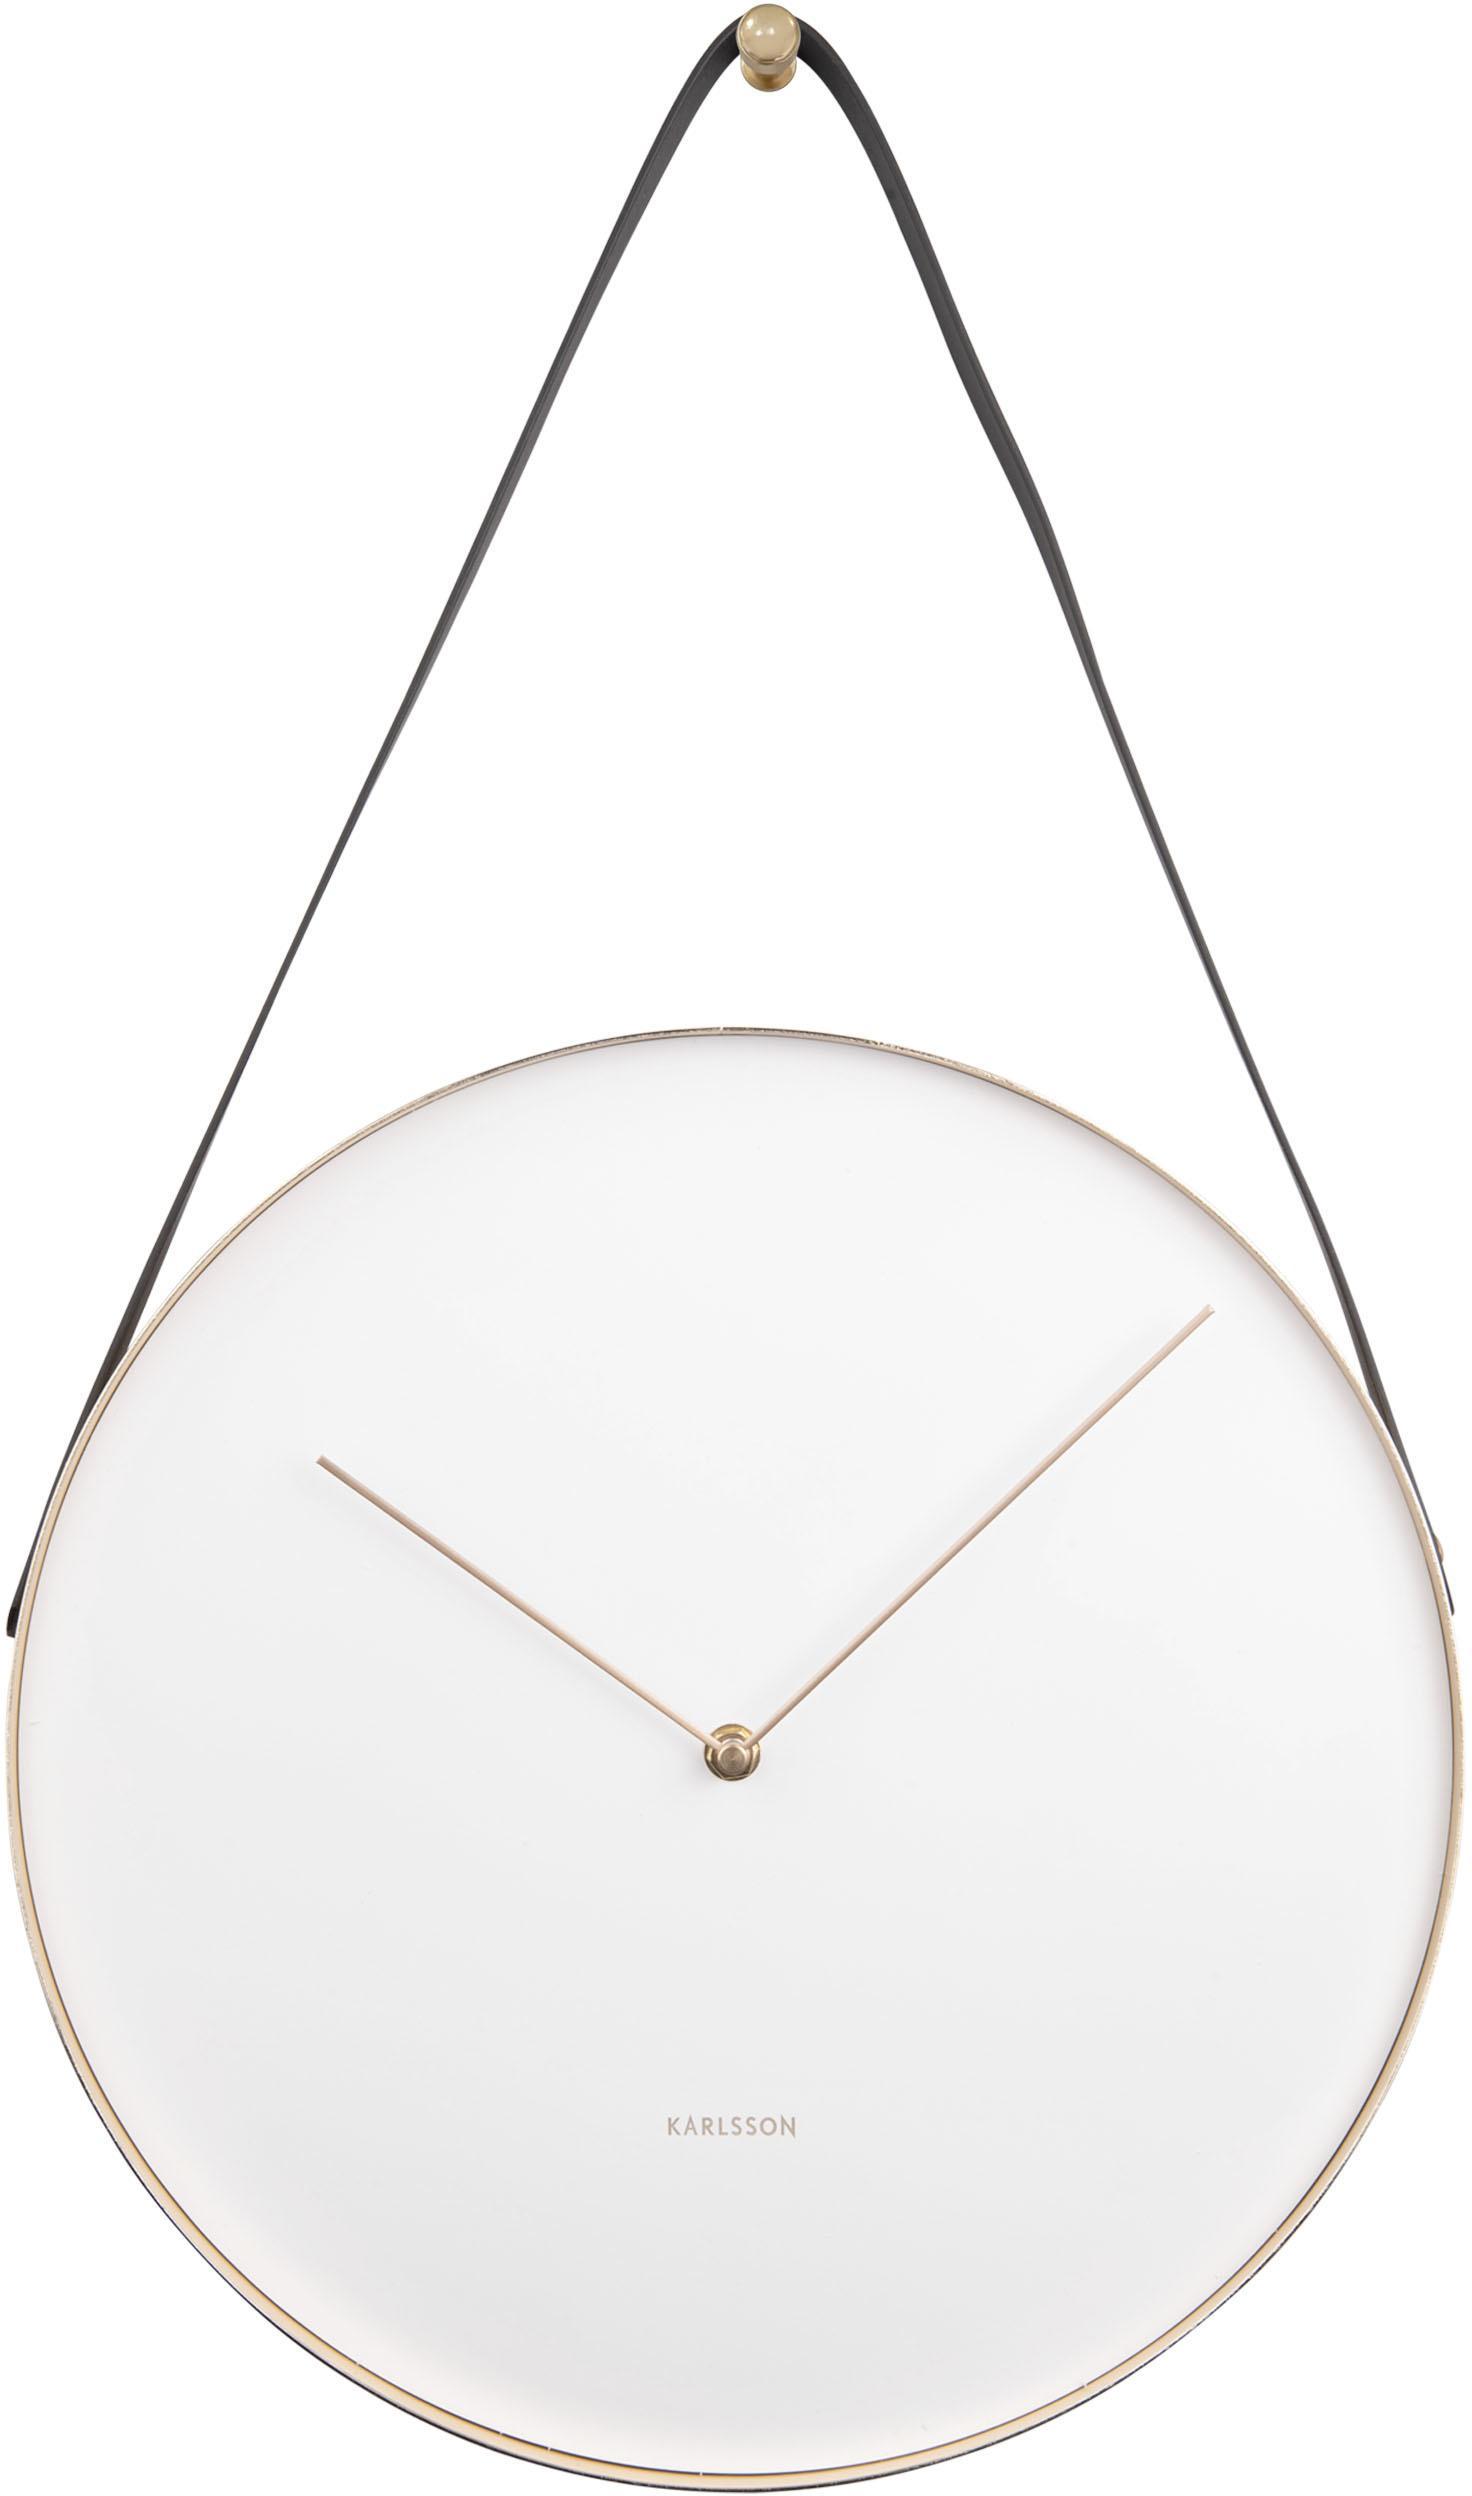 Reloj de pared Belt, Metal recubierto, Blanco, latón, negro, Ø 34 cm